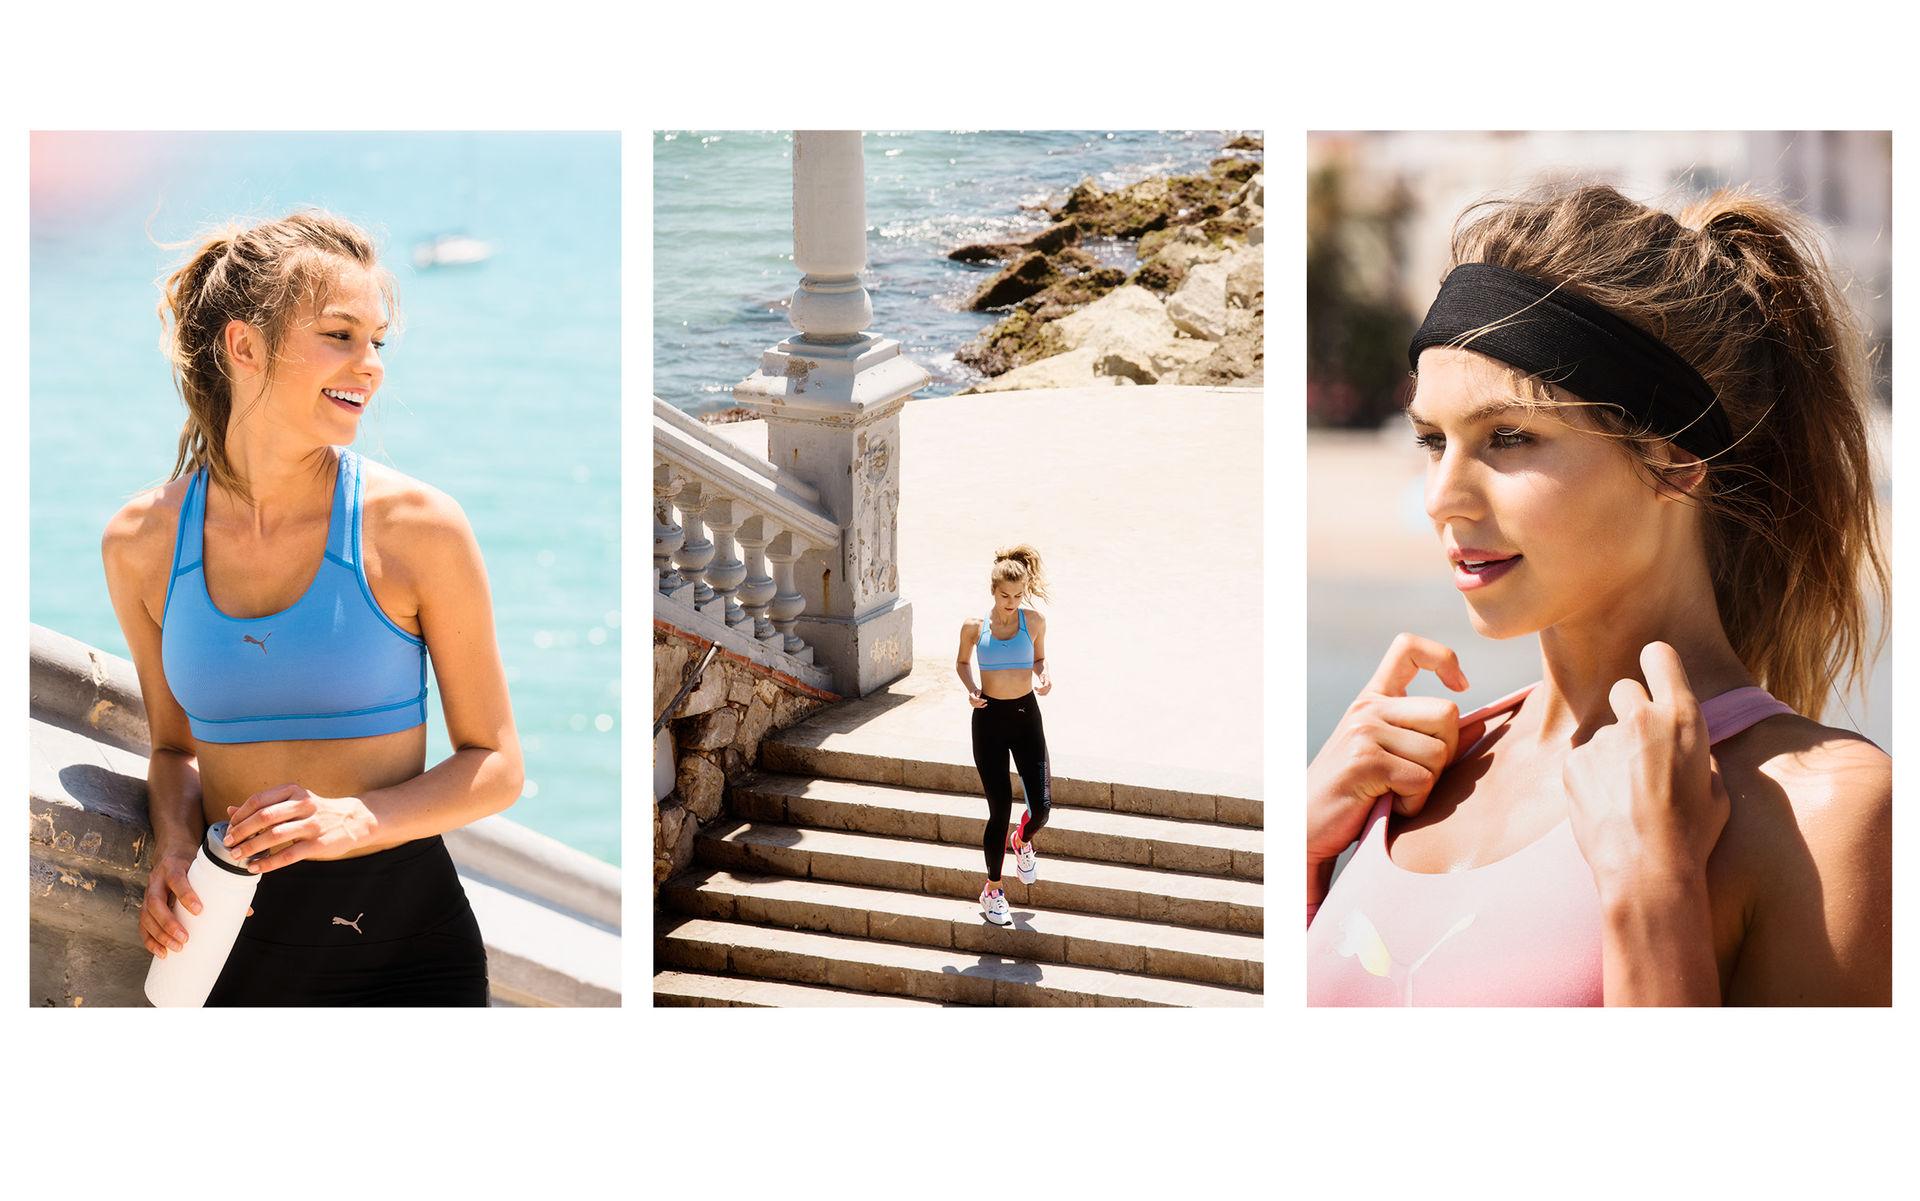 Markus-Henttonen-campaigns-Fitness-Puma